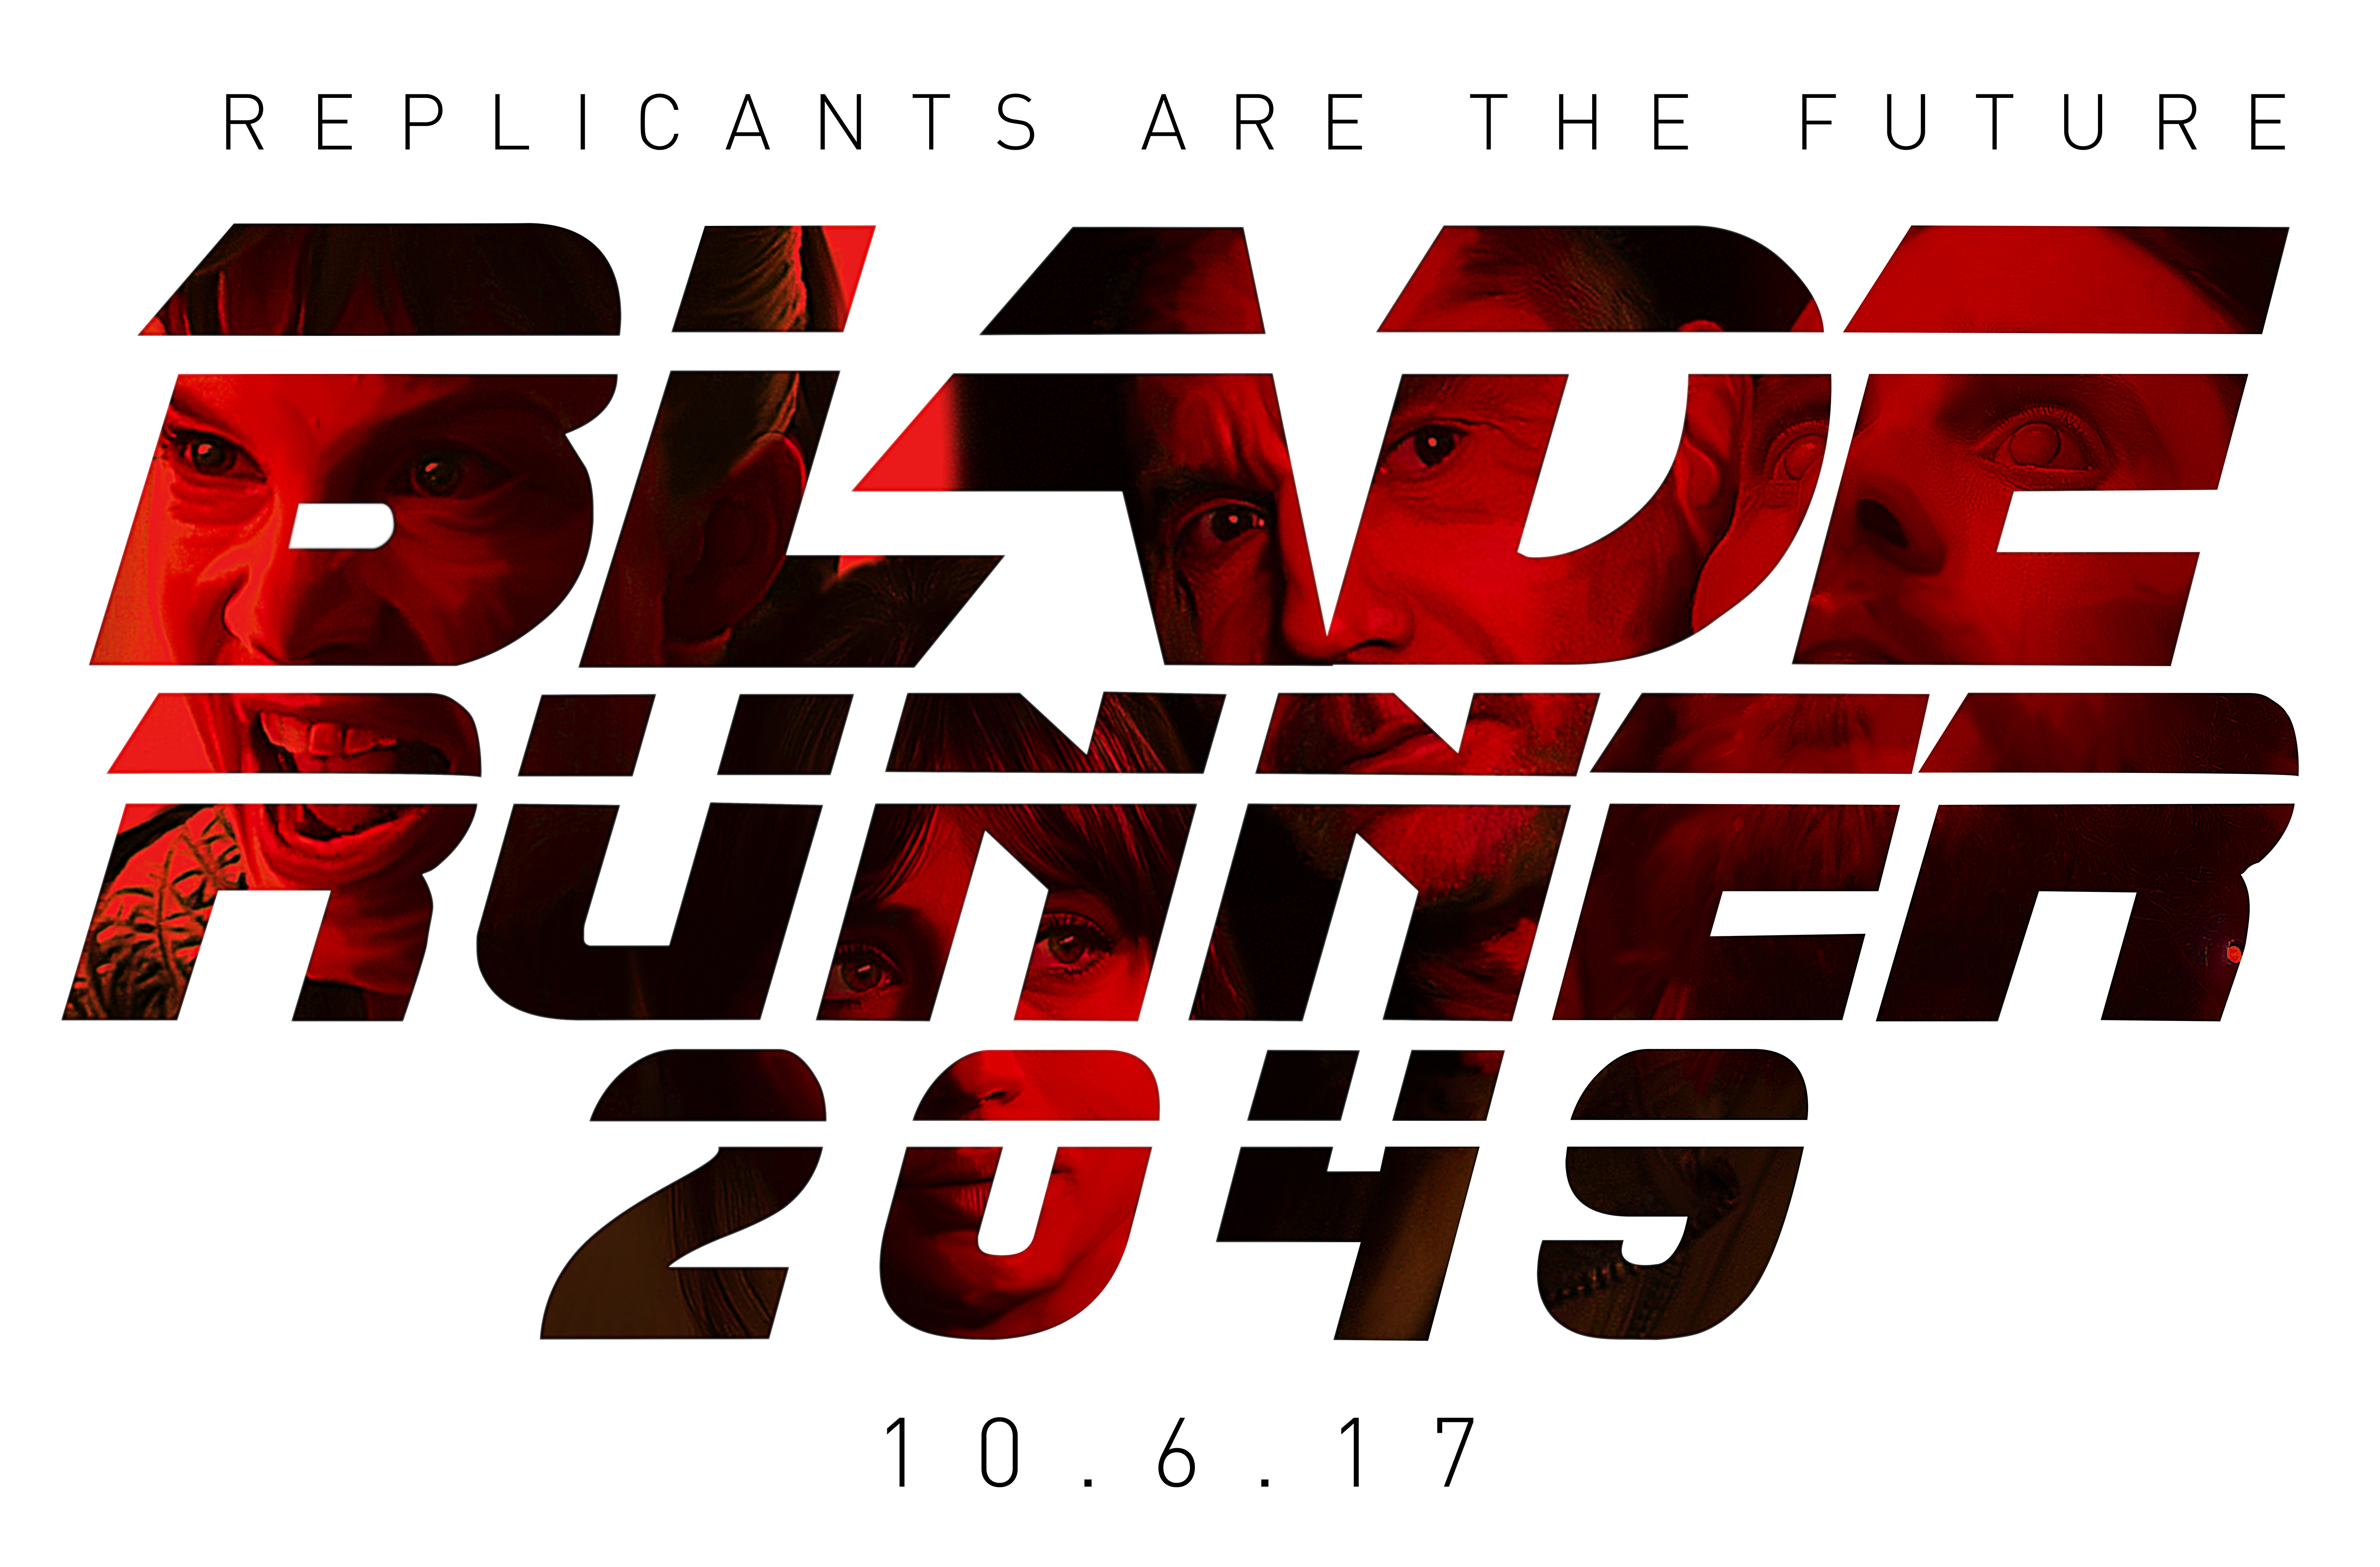 Blade Runner 2049 - Photoshop digital painting